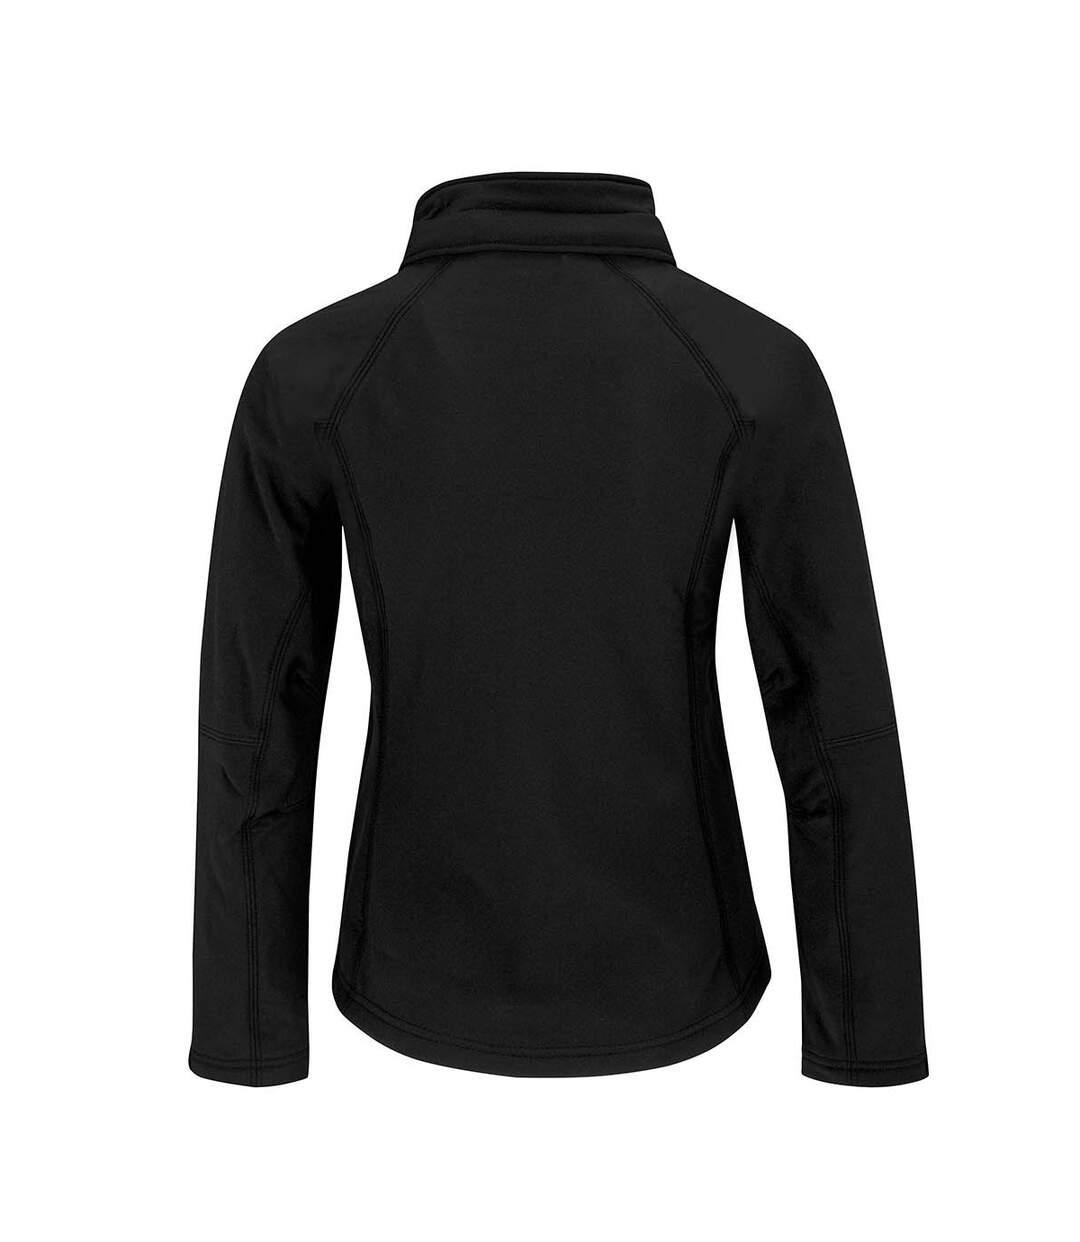 B&C Womens Hooded Premium Softshell Jacket (Windproof, Waterproof & Breathable) (White) - UTBC2004